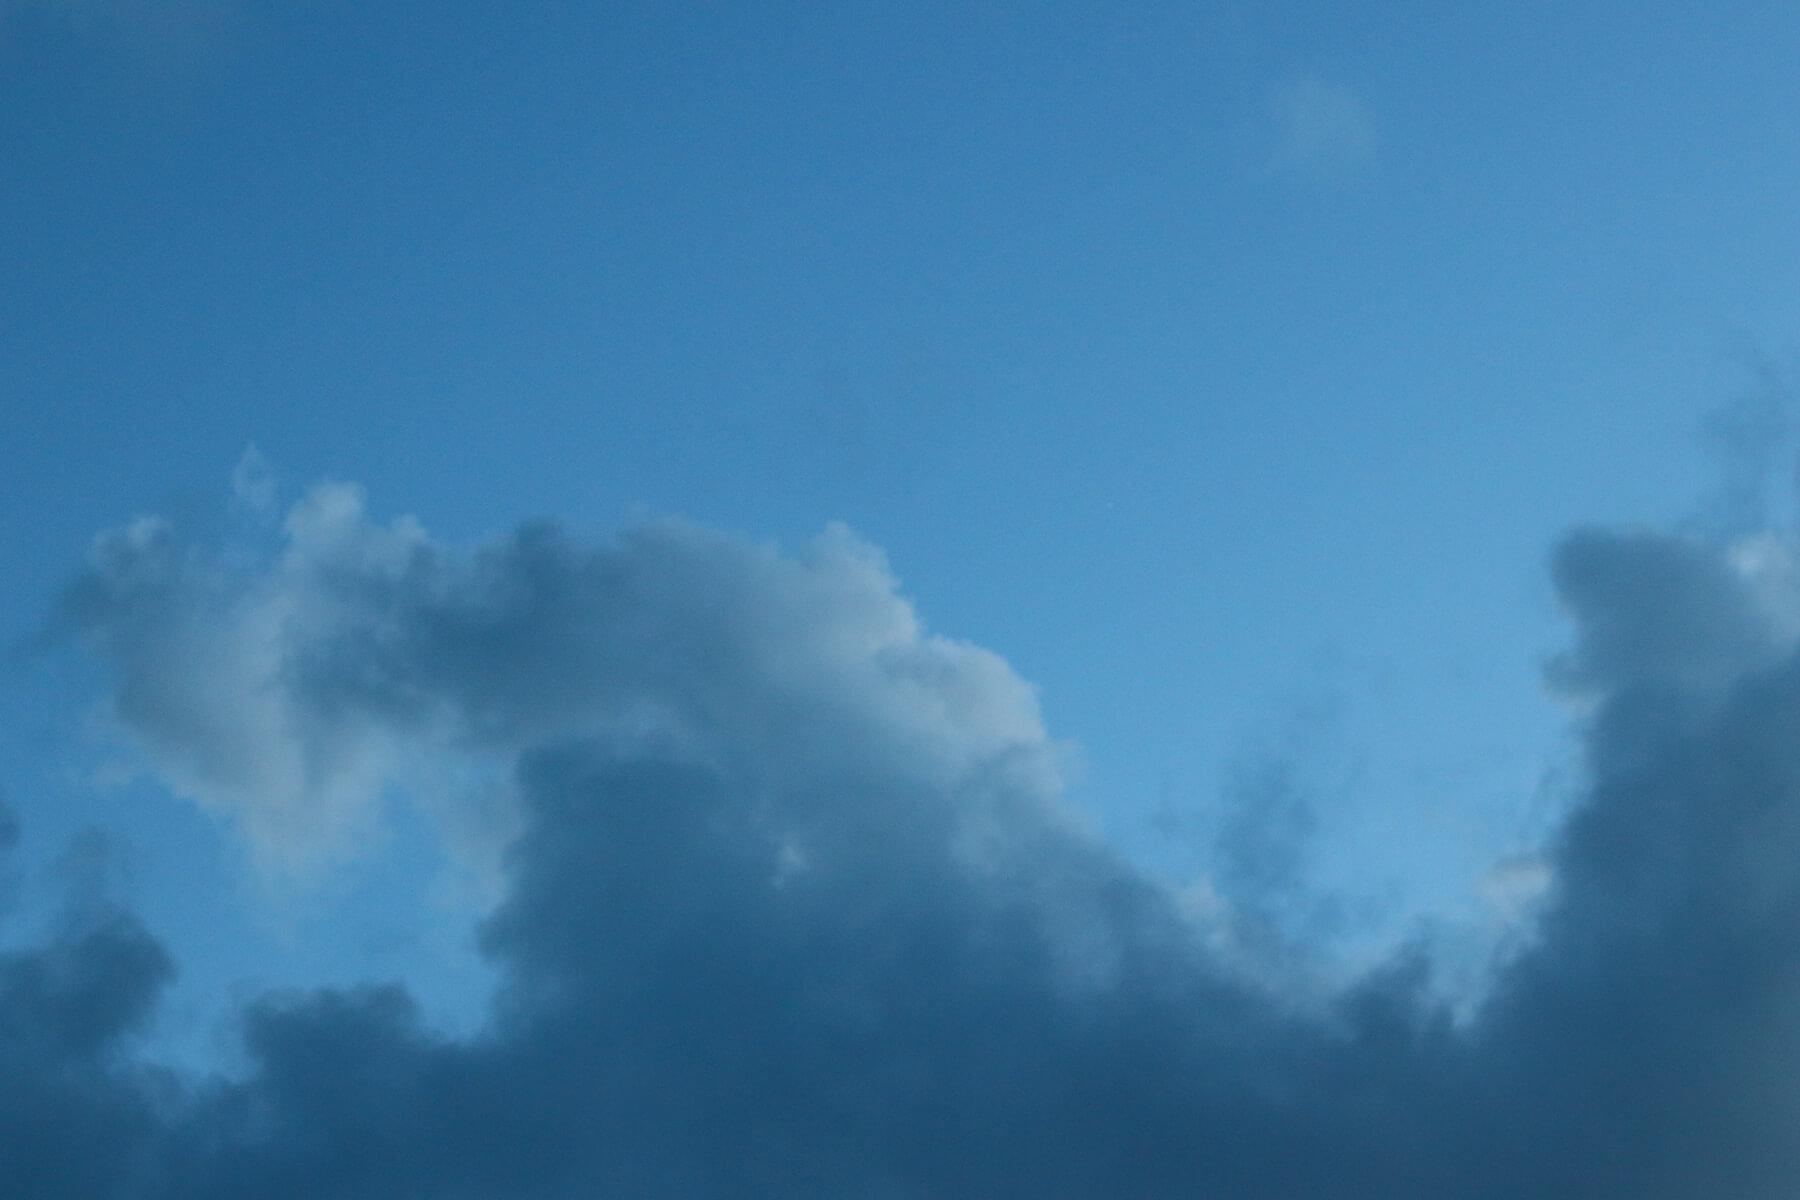 Clouds, Key West, Florida